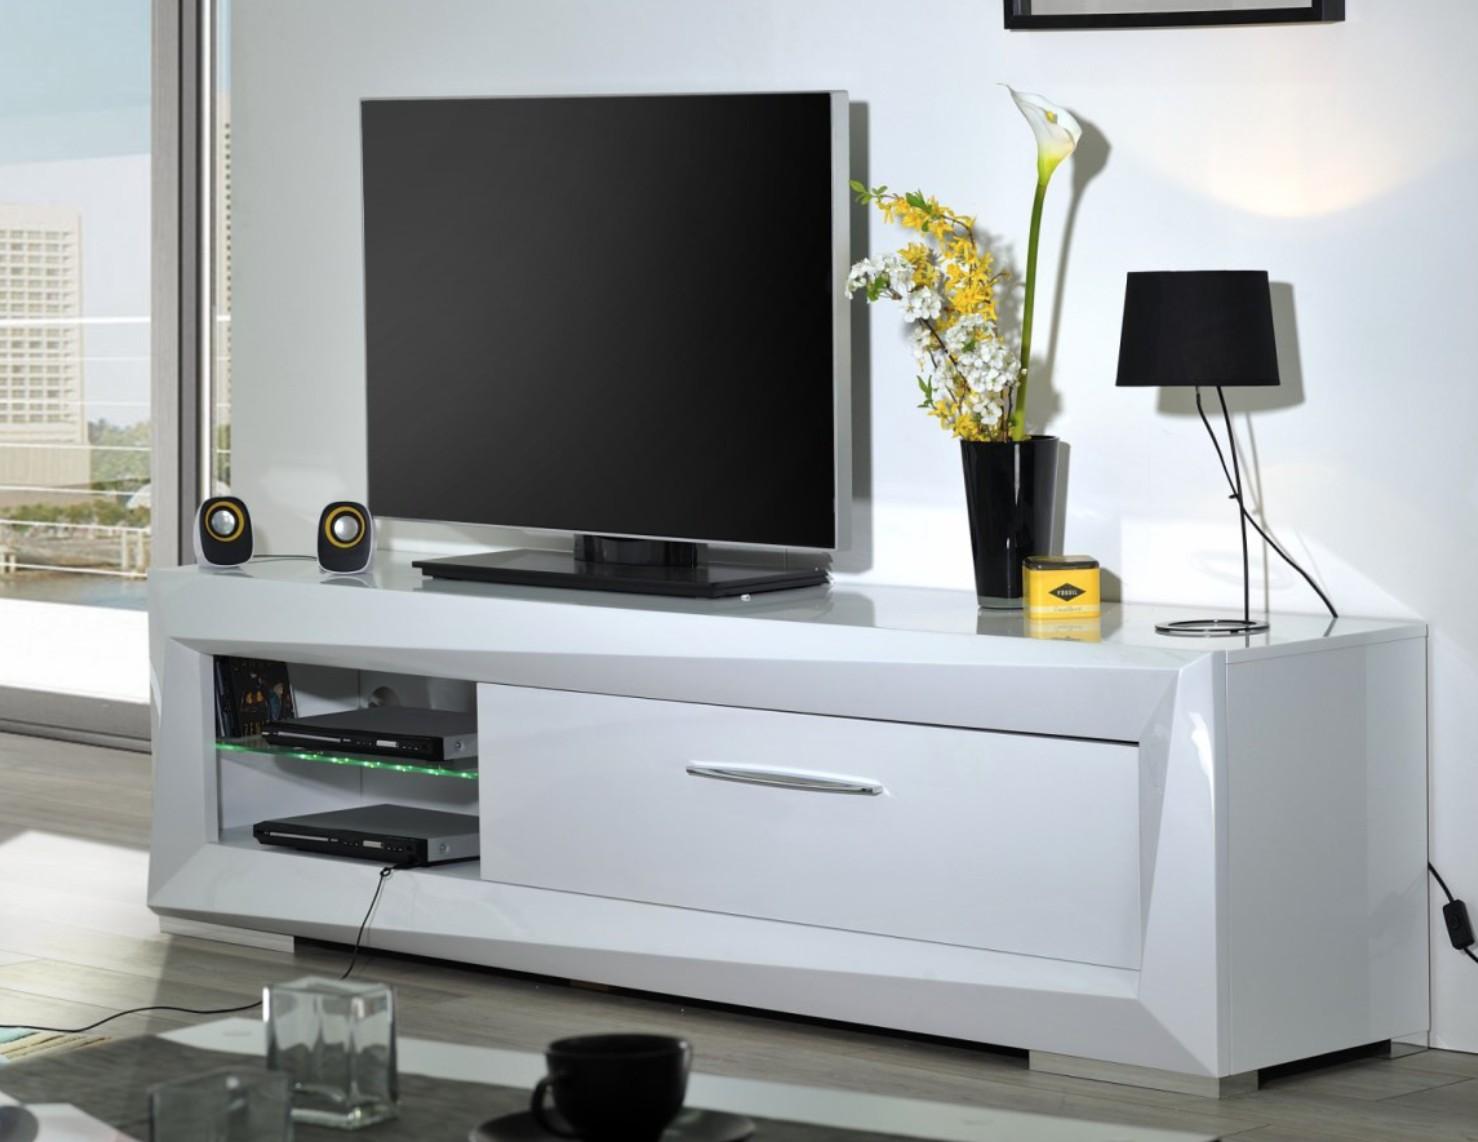 meuble tv 1 tiroir blanc laqu must mod le sans led. Black Bedroom Furniture Sets. Home Design Ideas